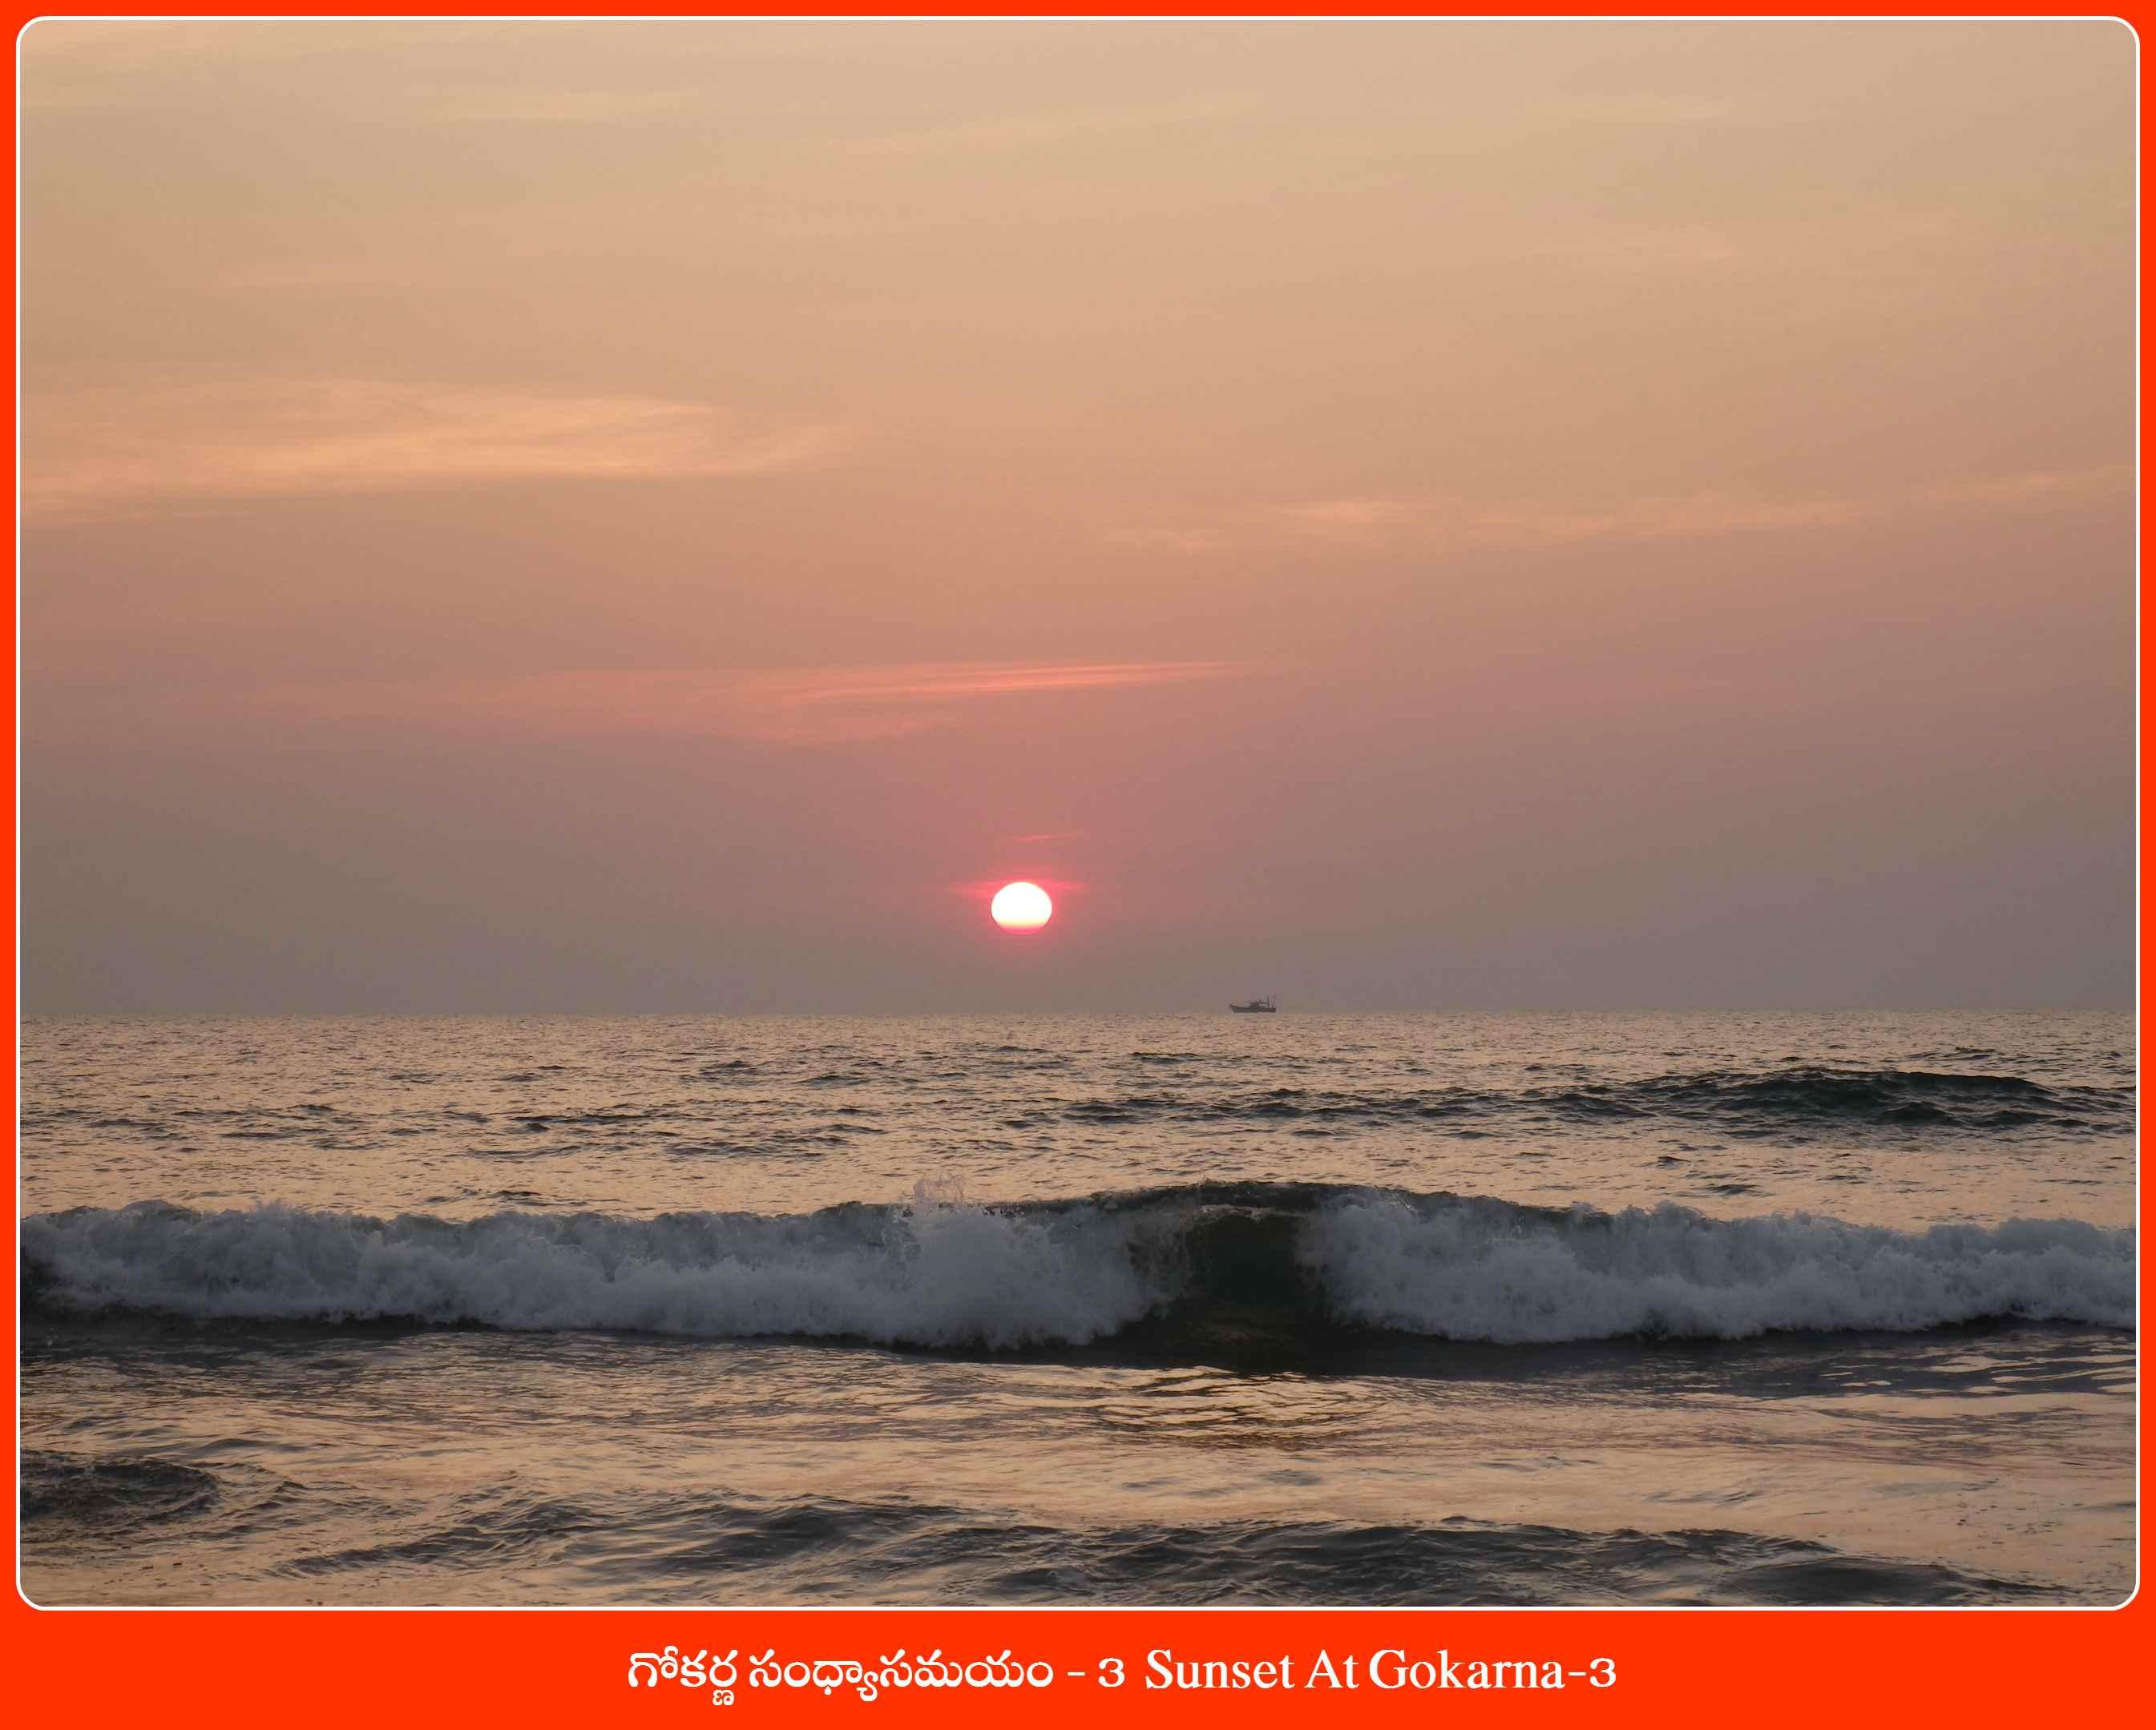 Sunset At Gokarna-3